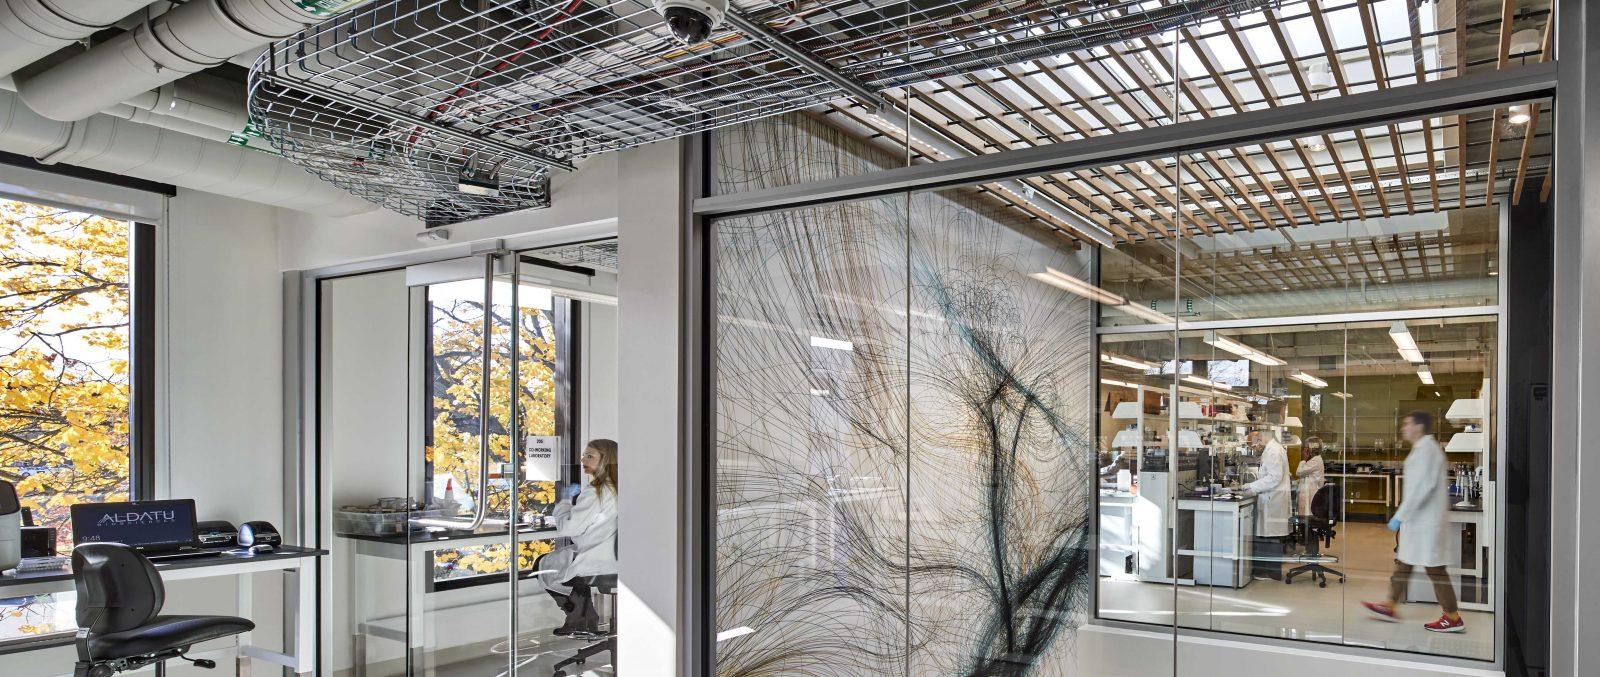 Pagliuca Harvard Life Lab Shepley Bulfinch